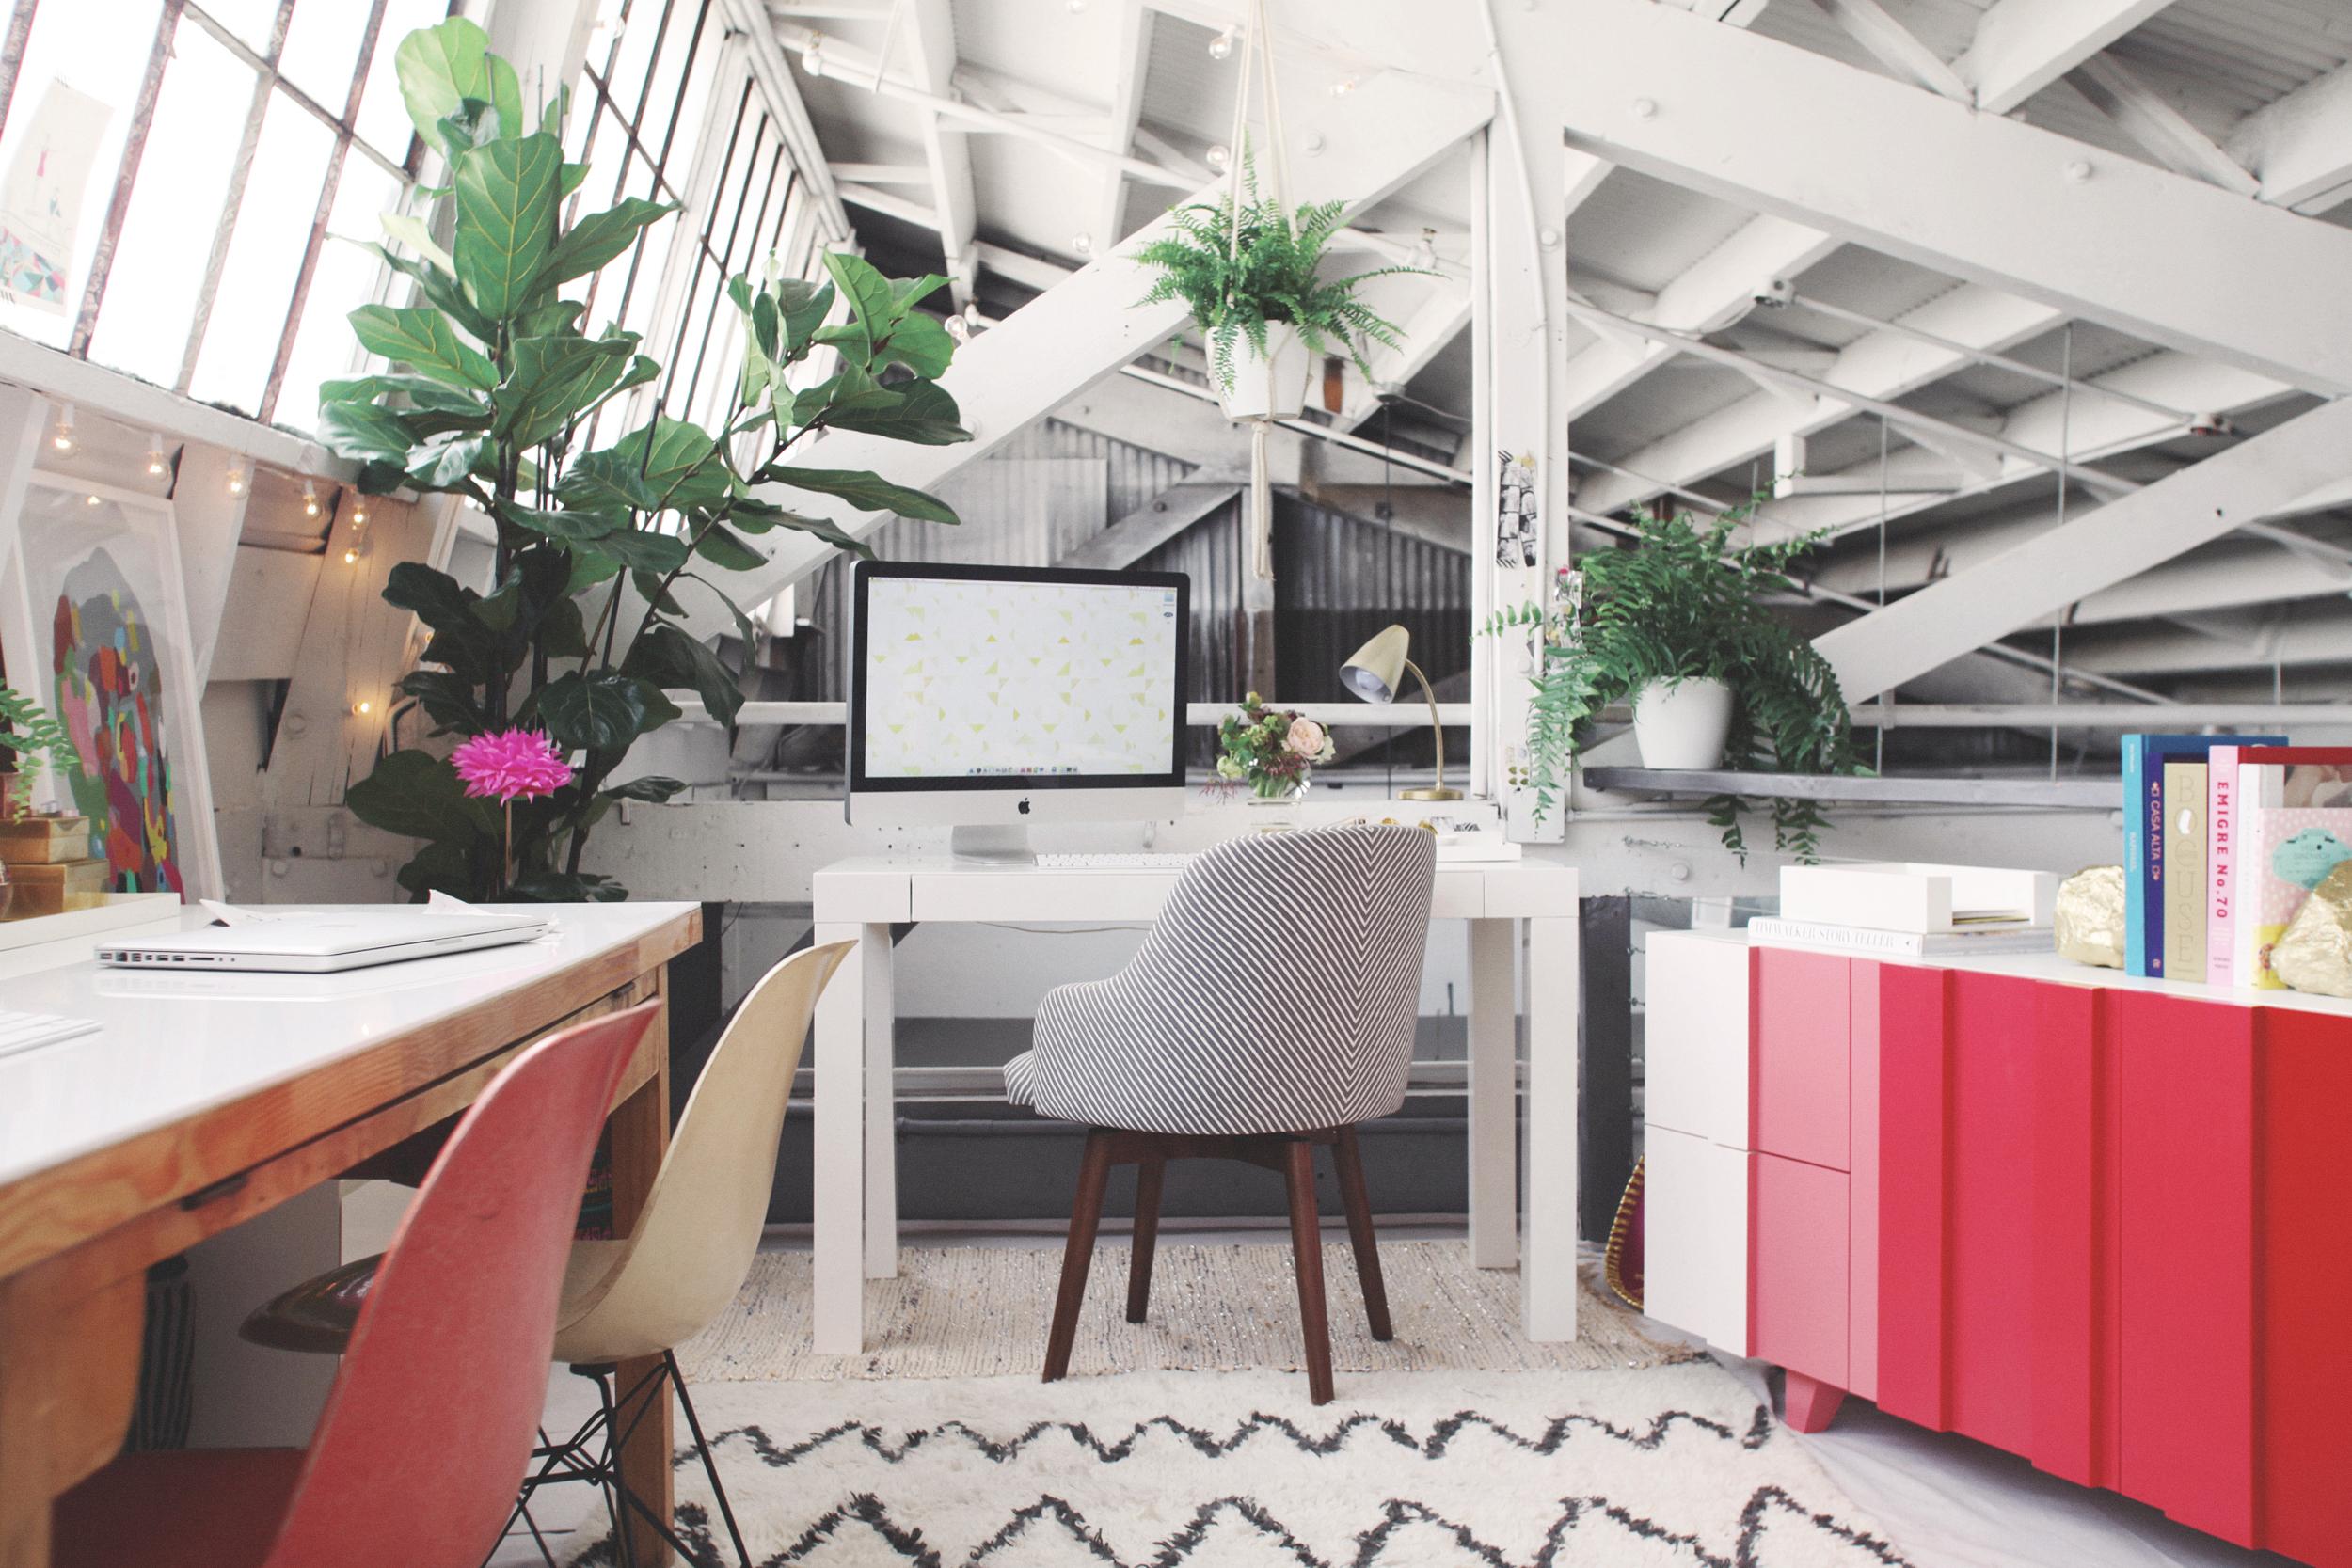 attic-loft-JessieWebster_Squarespace_22.jpg